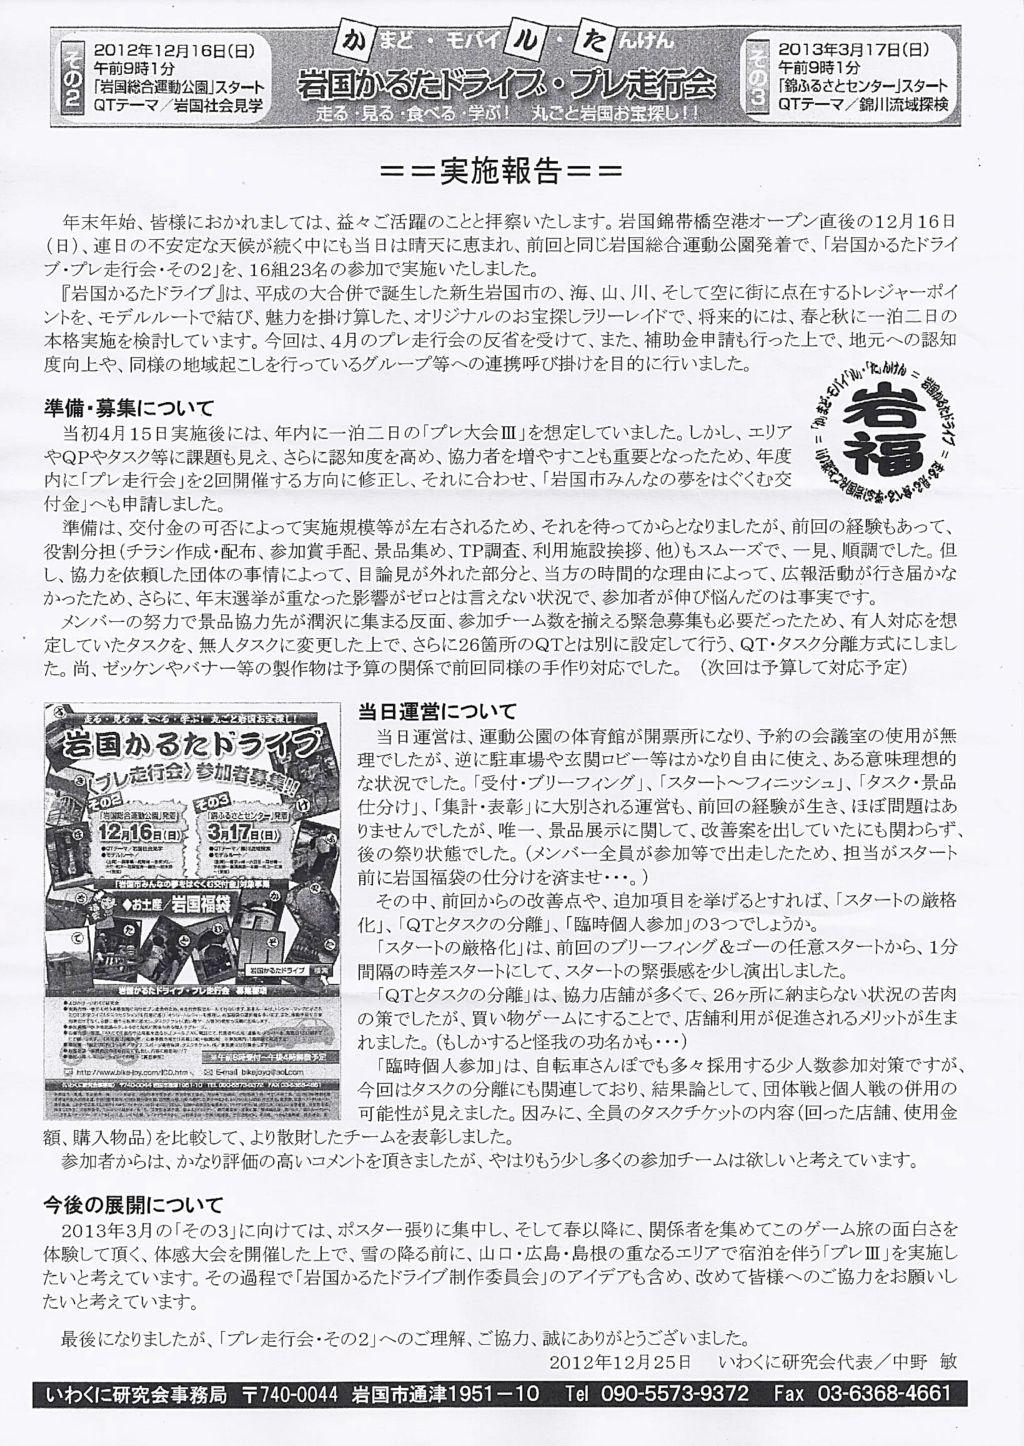 Scan_20130125_14_R.jpg